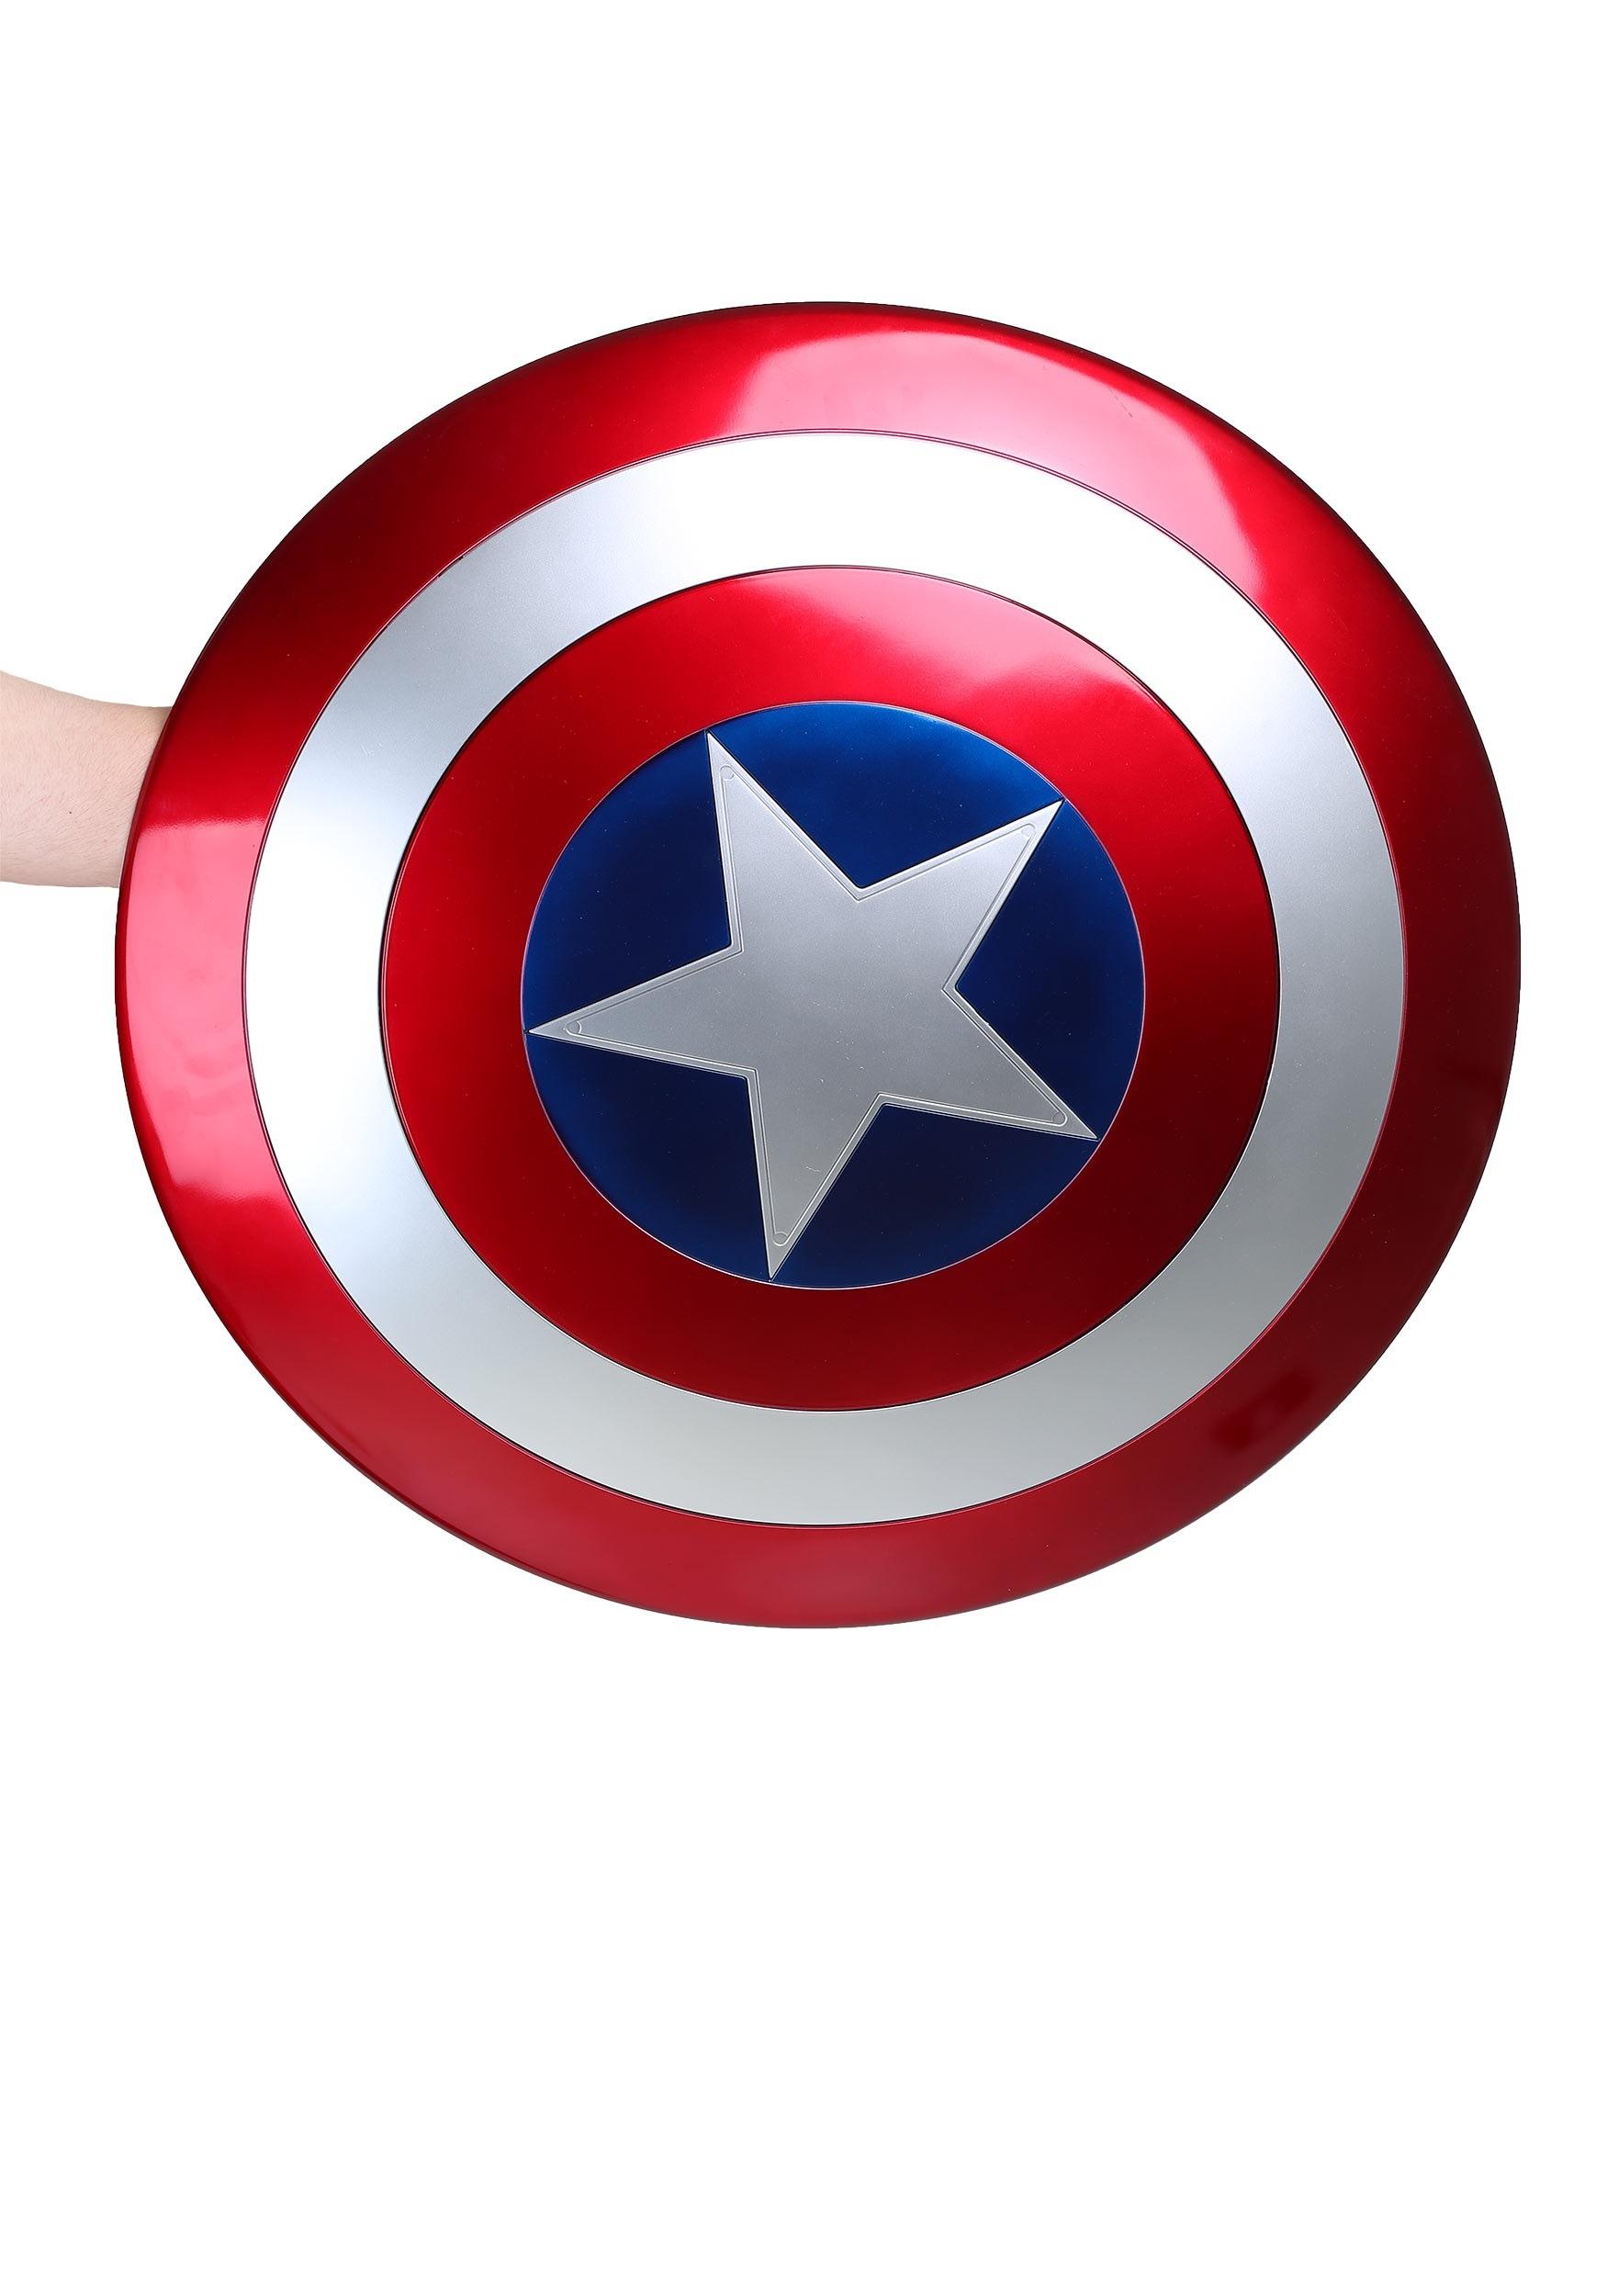 Marvel Legends Gear Captain America Shield Replica EEDHSB7436